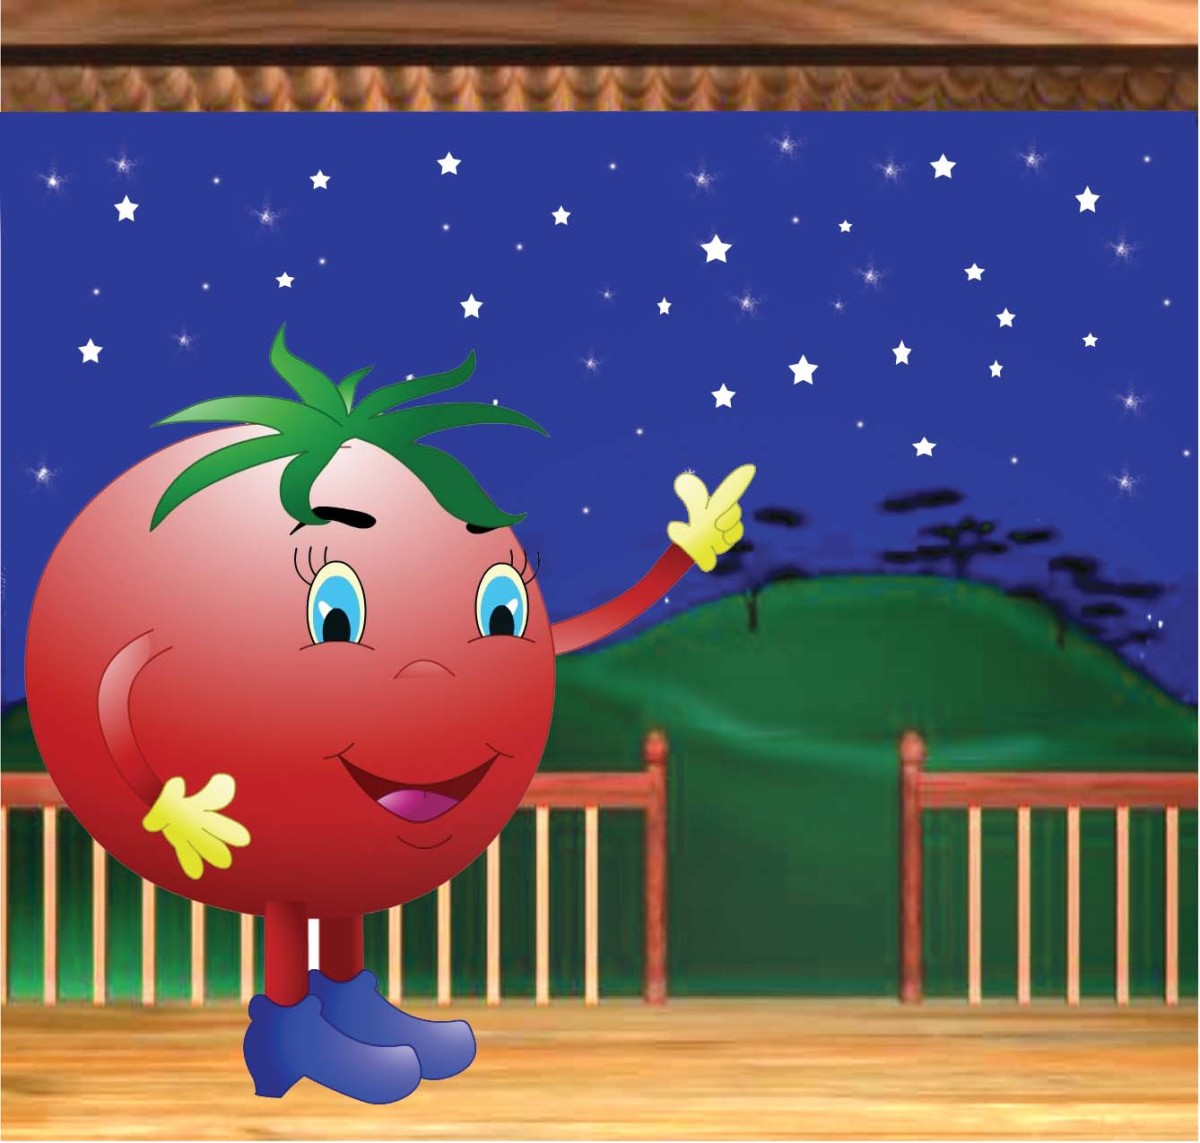 Nursery Rhymes - Twinkle, Twinkle, Little Star